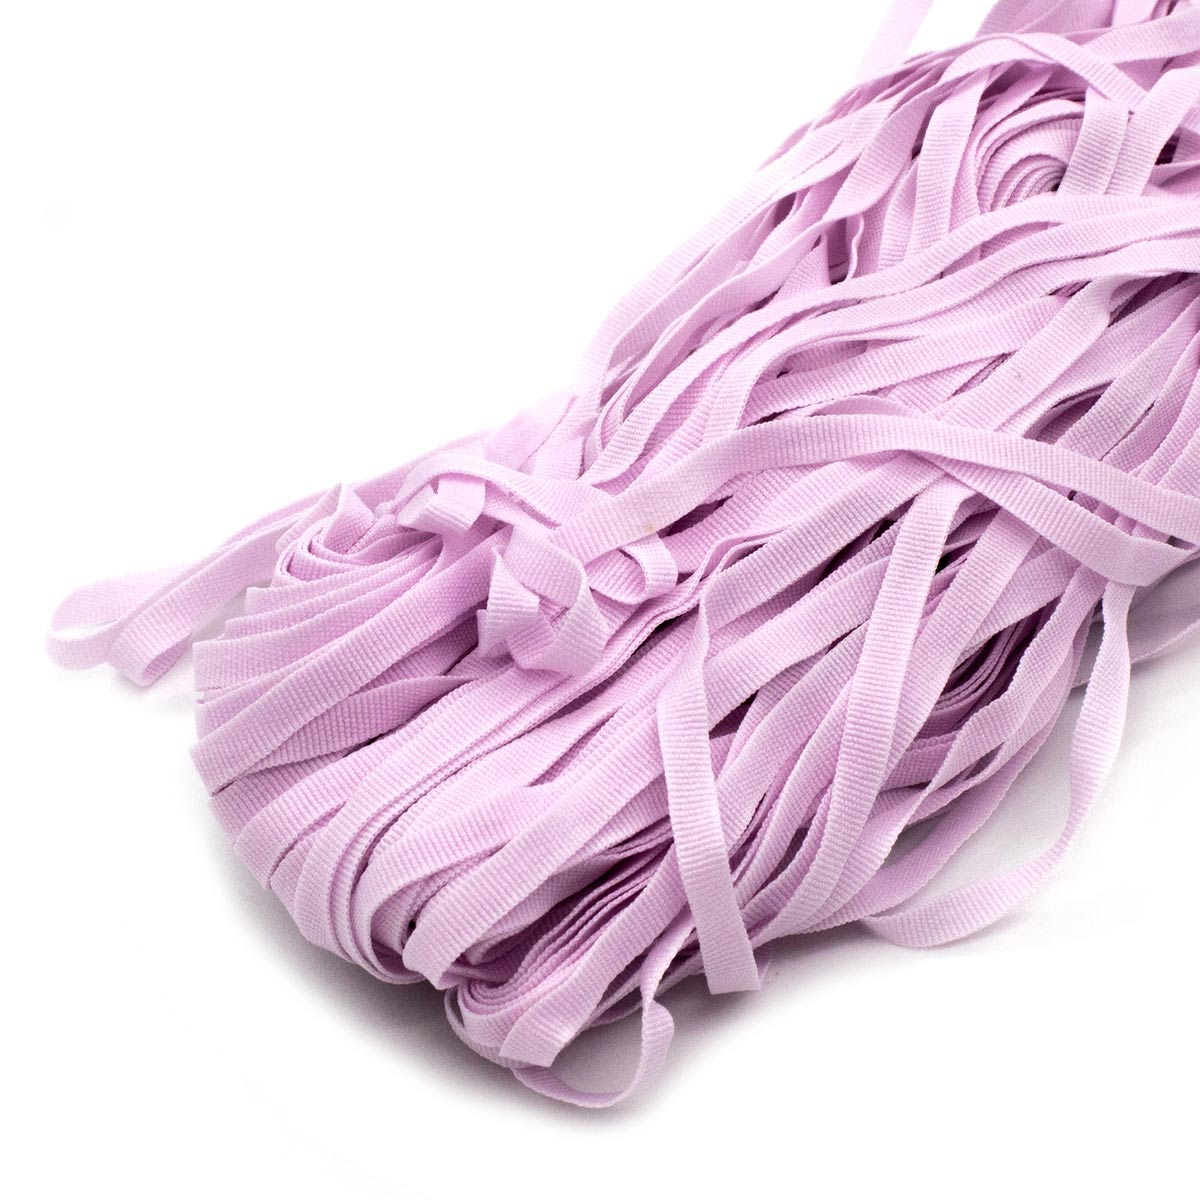 STP/01 эластичная лента для стабилизации швов 4мм*50м, нежно-розовый